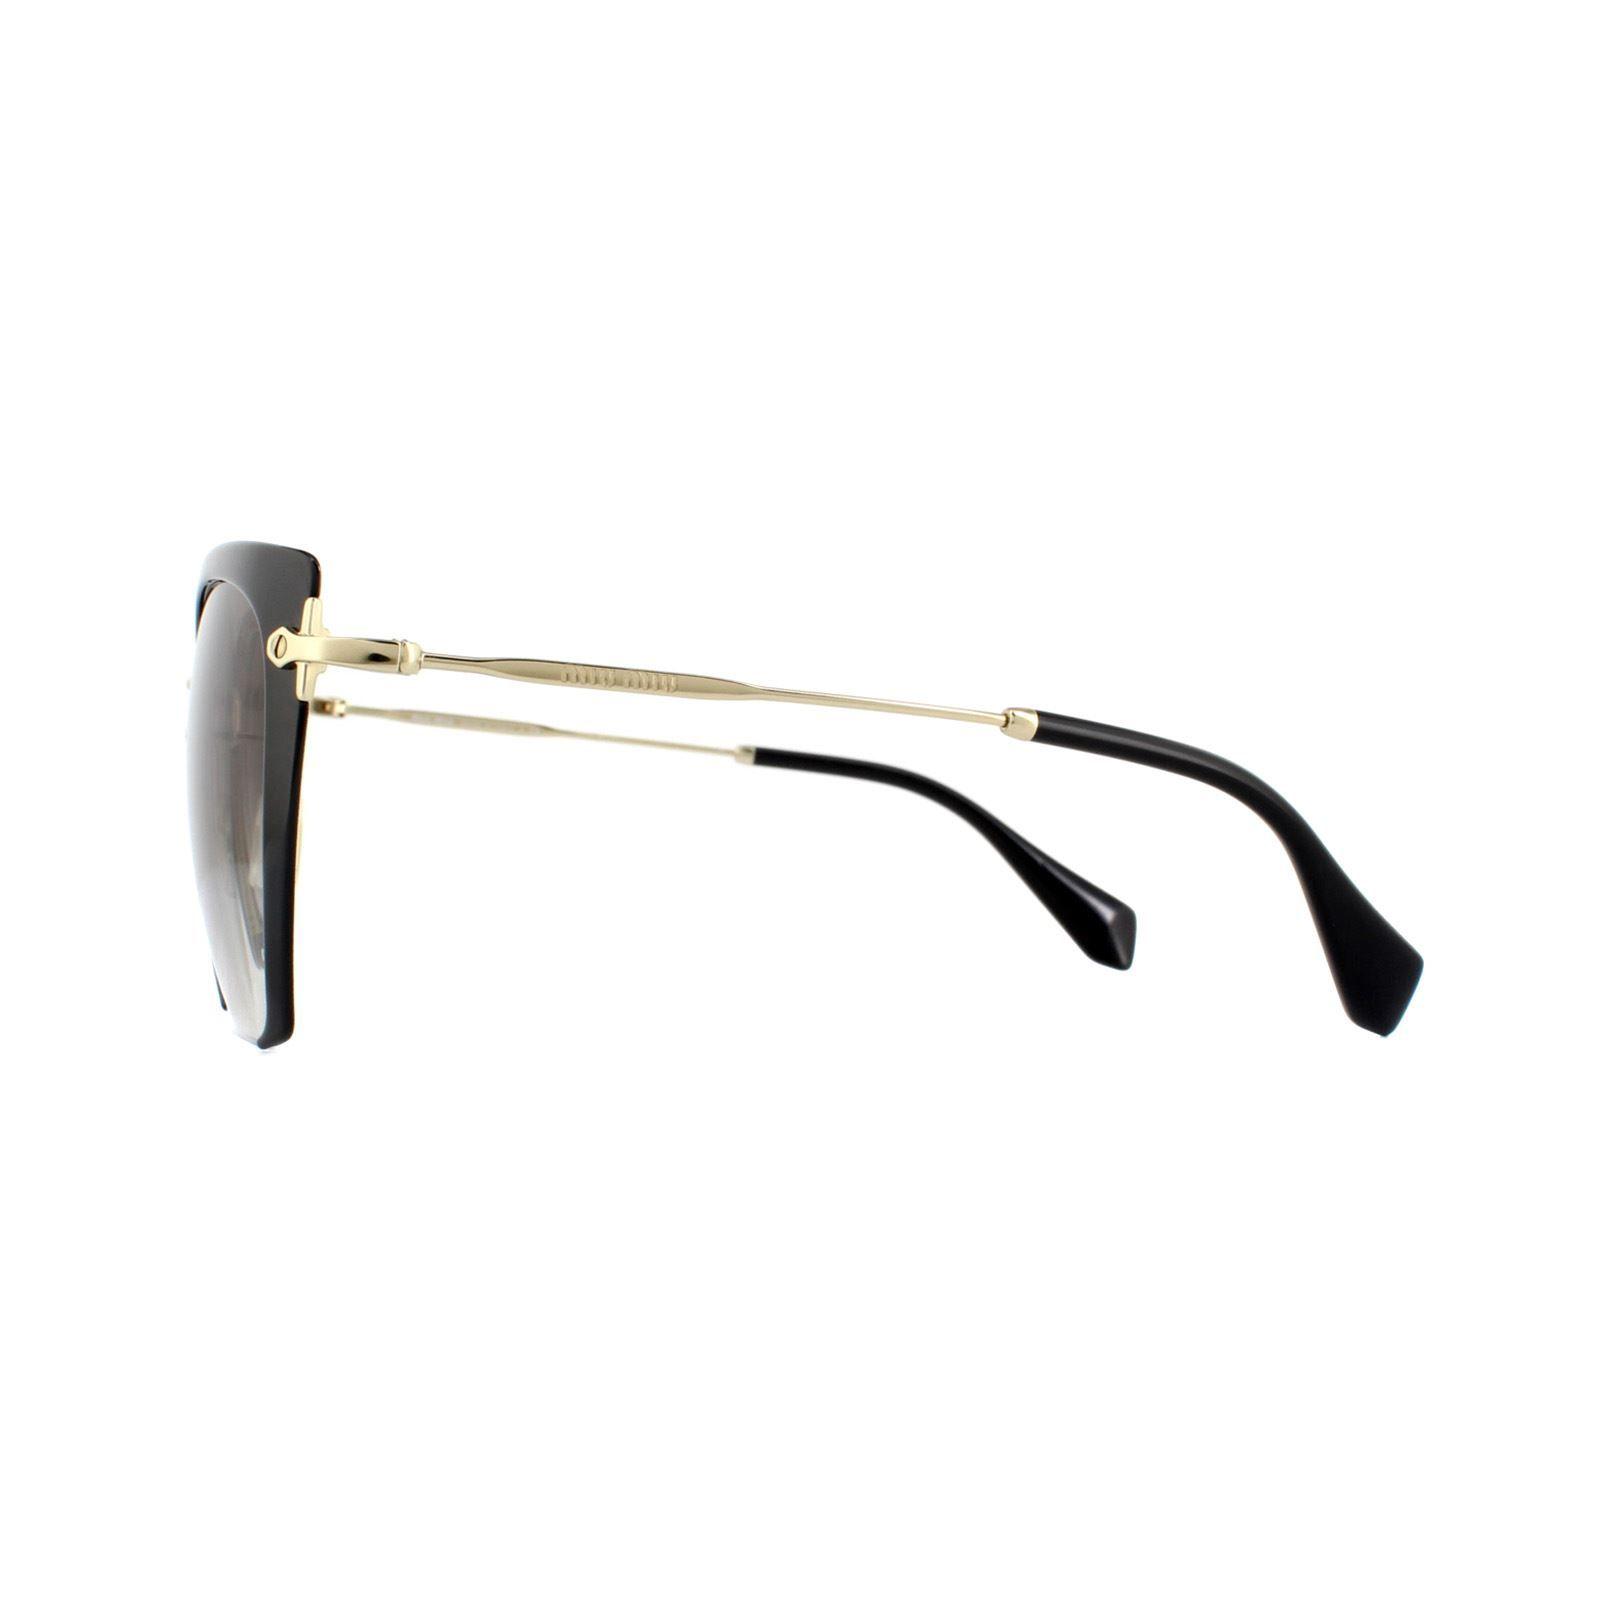 Miu Miu Sunglasses MU52RS 1AB0A7 Black With Gold Arms Brown Gradient